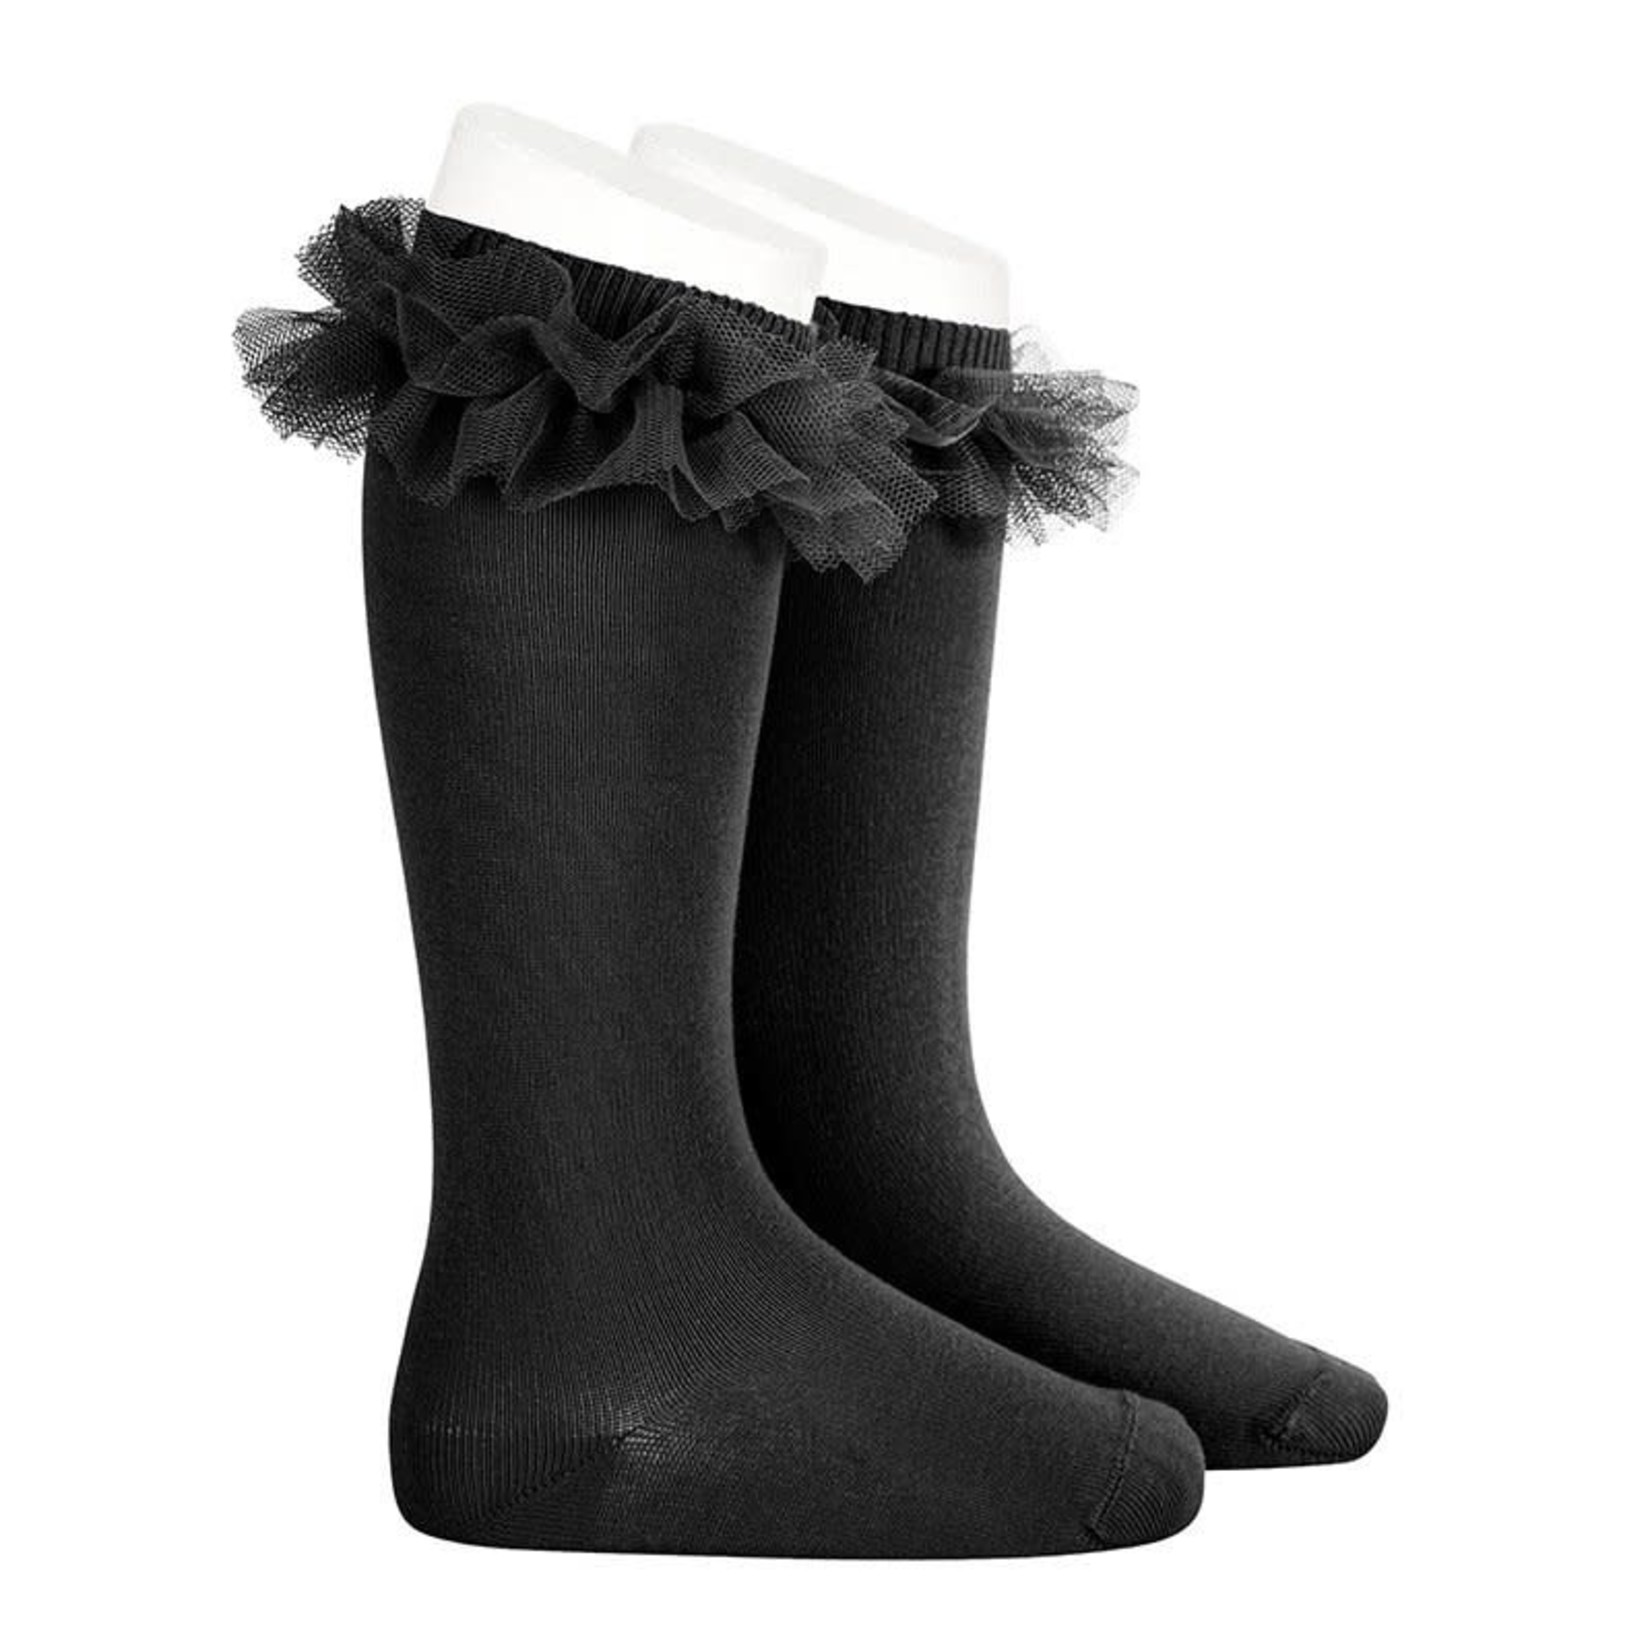 Condor Ruffle Socks Knee High - Black